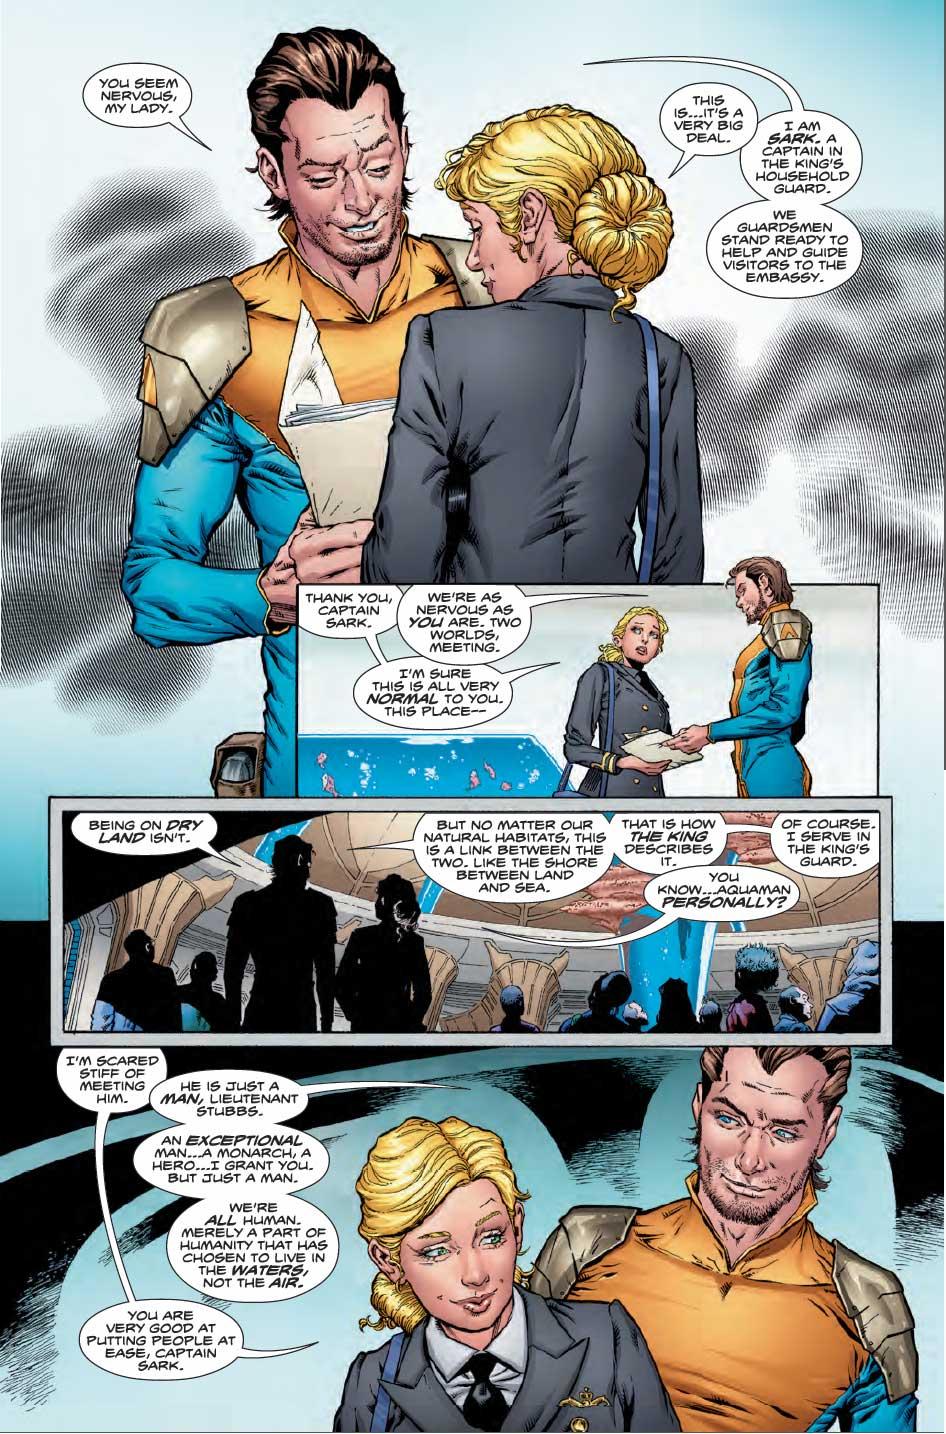 Aquaman #1 by Dan Abnett, Brad Walker, Andrew Hennessey, Gabe Eltaeb, and more